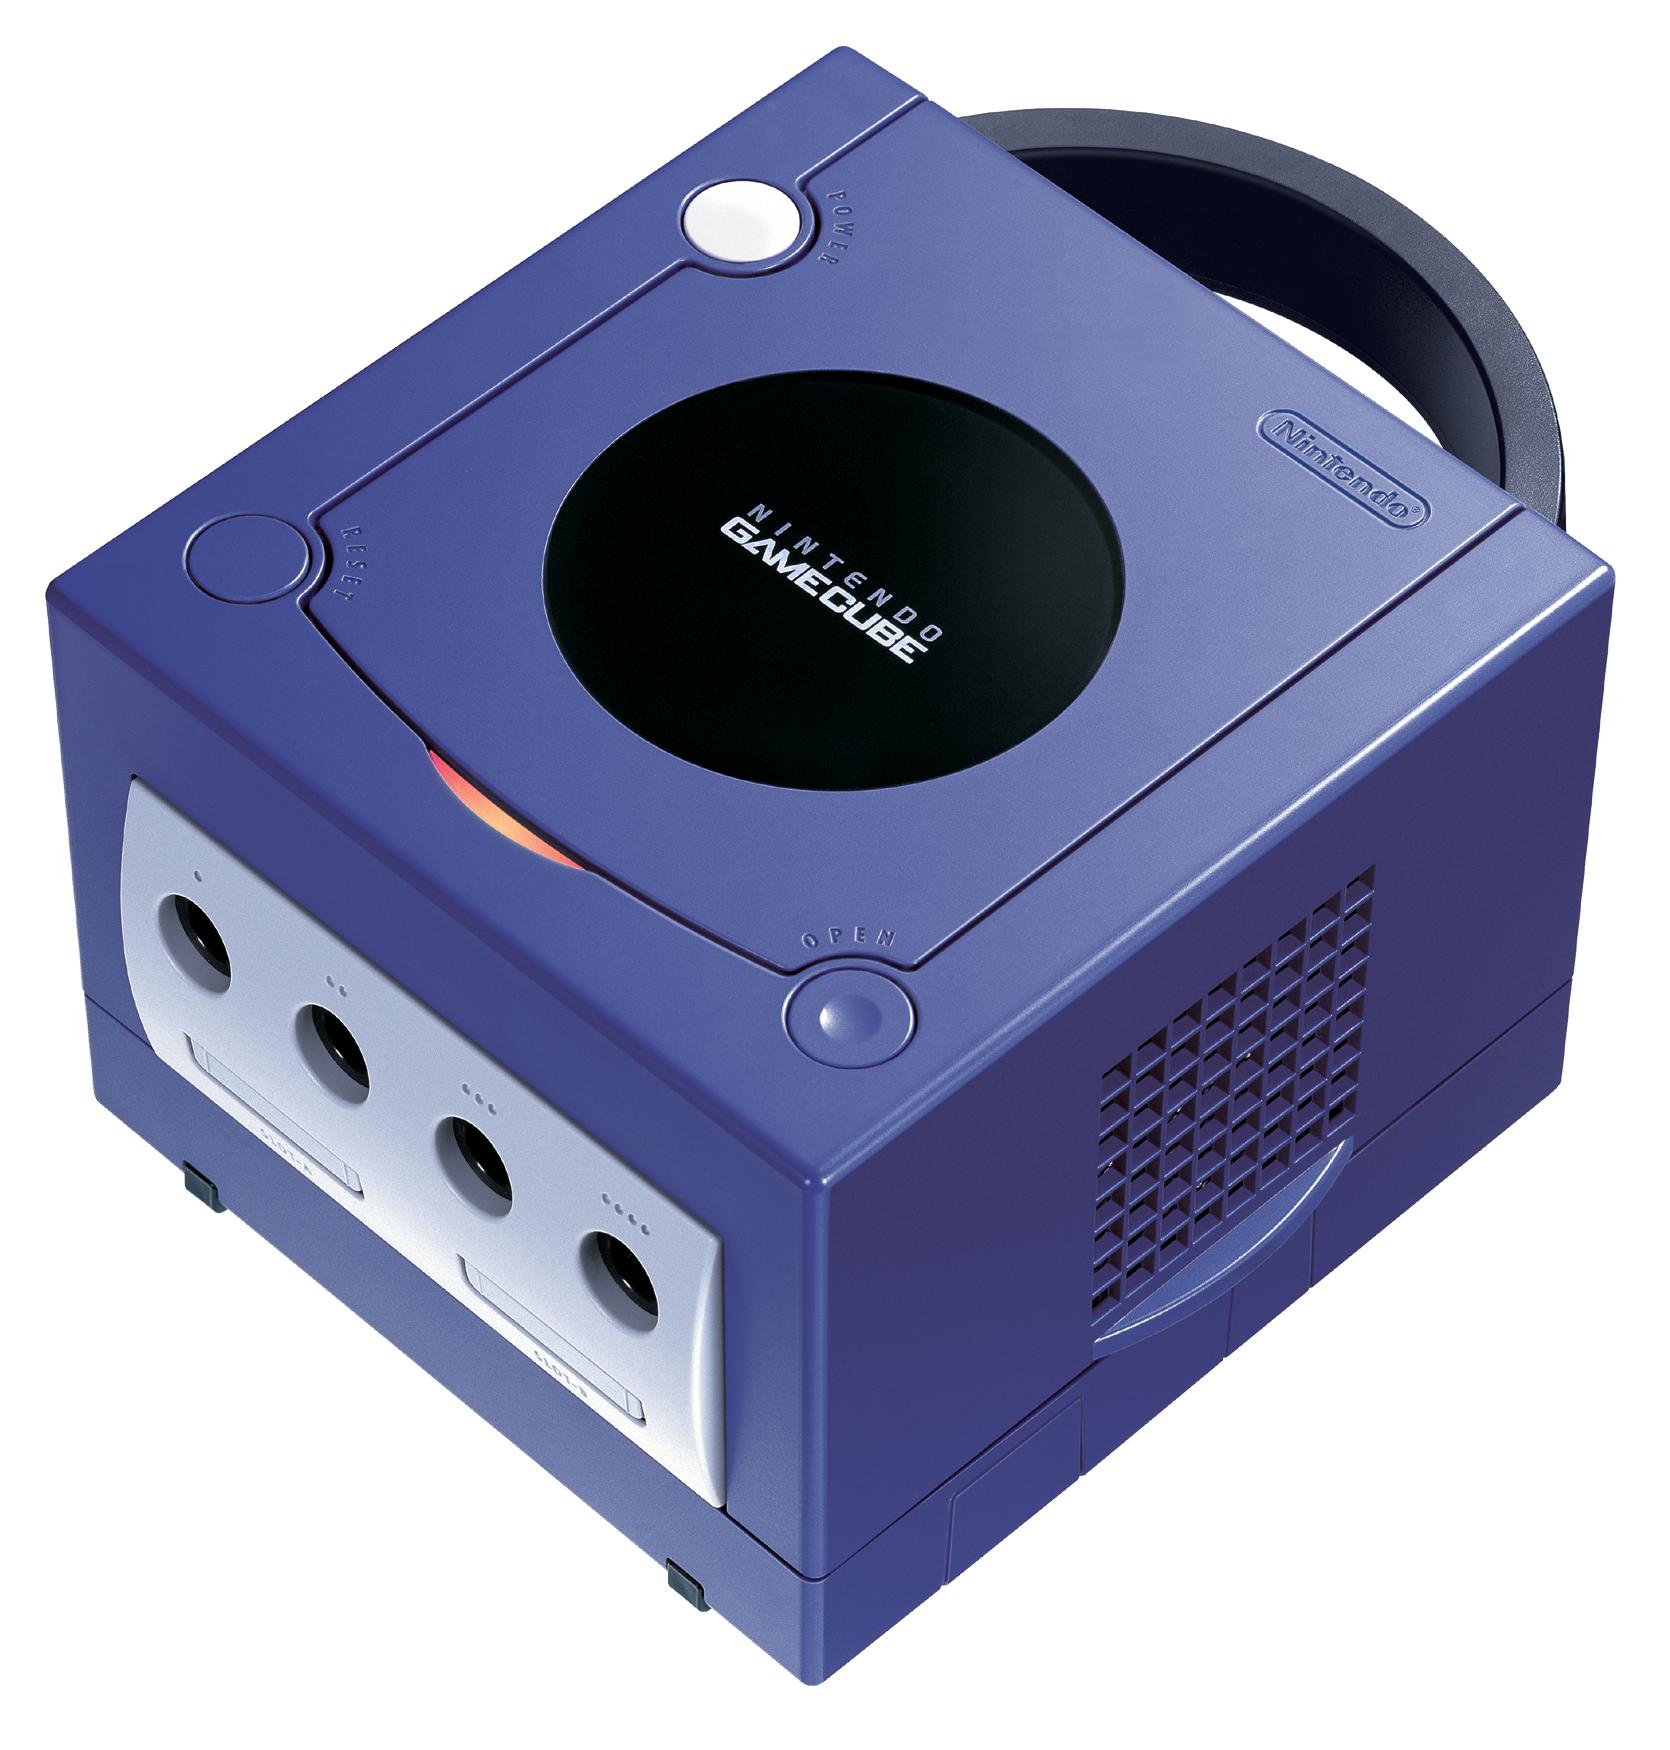 indigo_console_alt_6_nintendo_gamecube.png